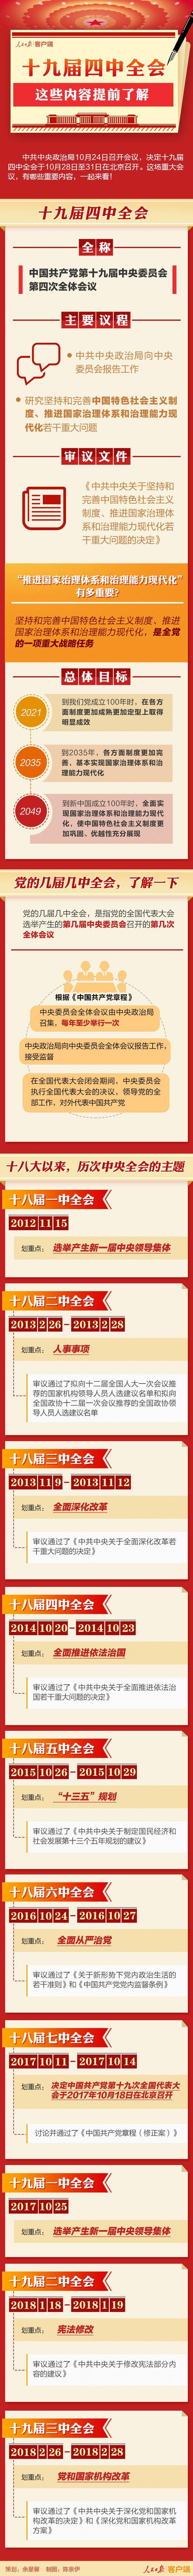 au8平台网页版网址_中国首批现役航天员只有他没执行过飞天任务(图)